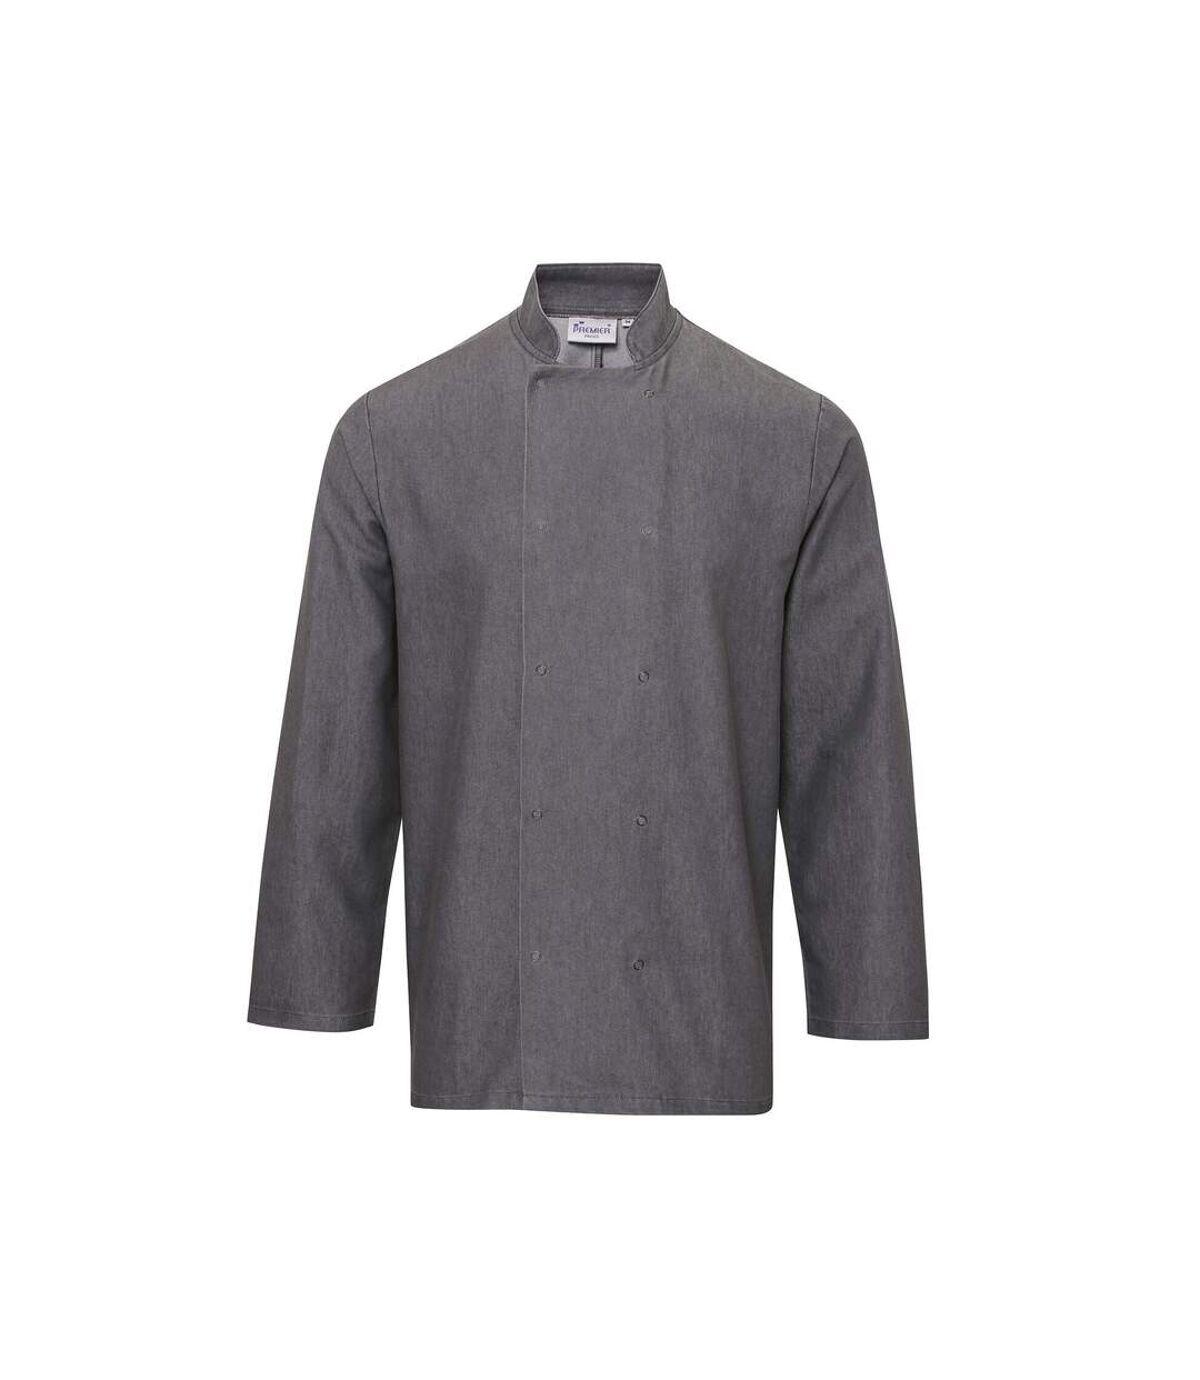 Premier Unisex Denim Chefs Jacket (Pack of 2) (Grey Denim) - UTRW6831